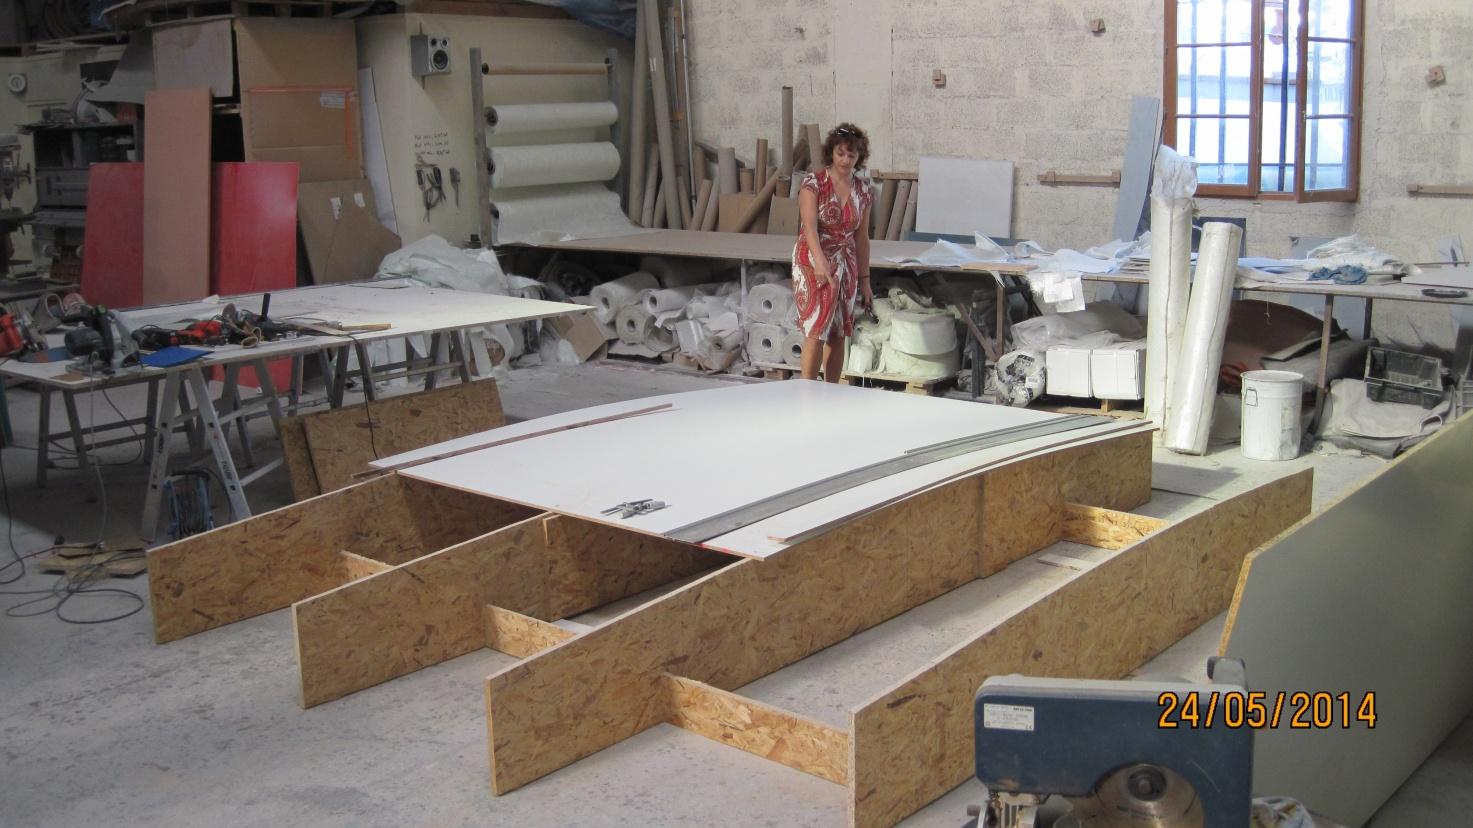 Click image for larger version  Name:Bimini Construction du moule 24-5-14.jpg Views:204 Size:404.1 KB ID:110643